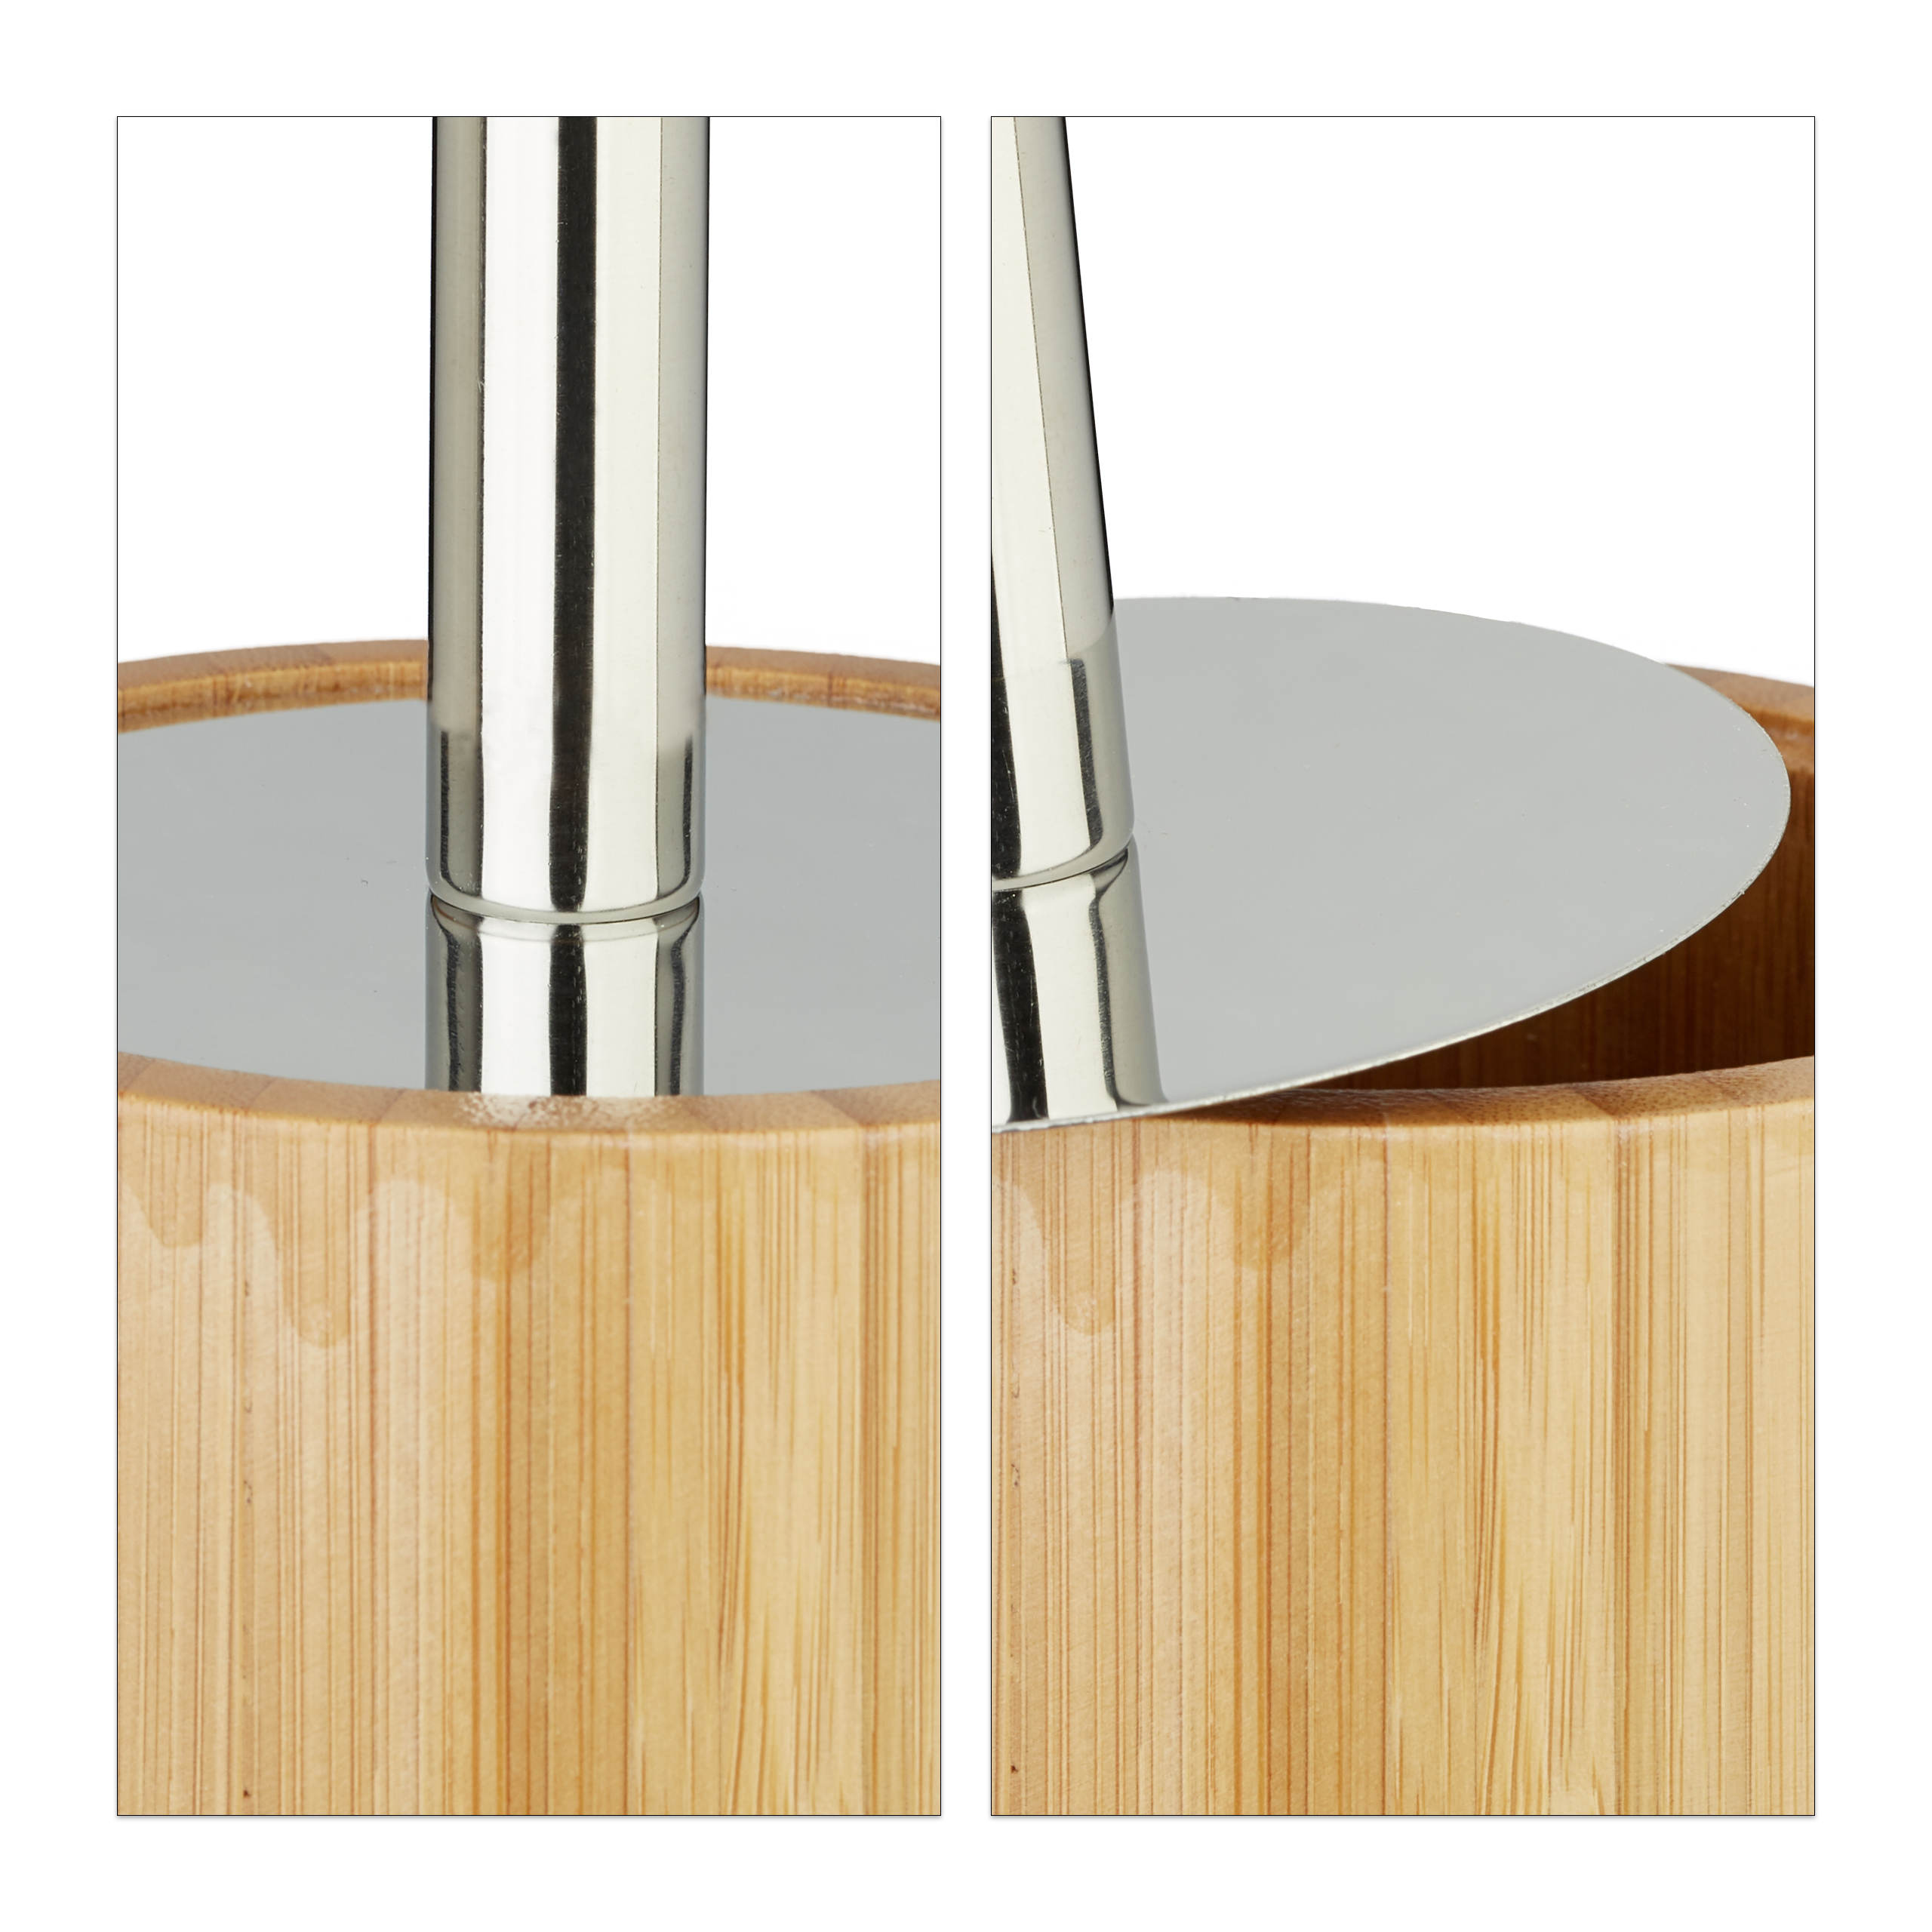 wc b rstenhalter bambus klob rstenhalter holz. Black Bedroom Furniture Sets. Home Design Ideas